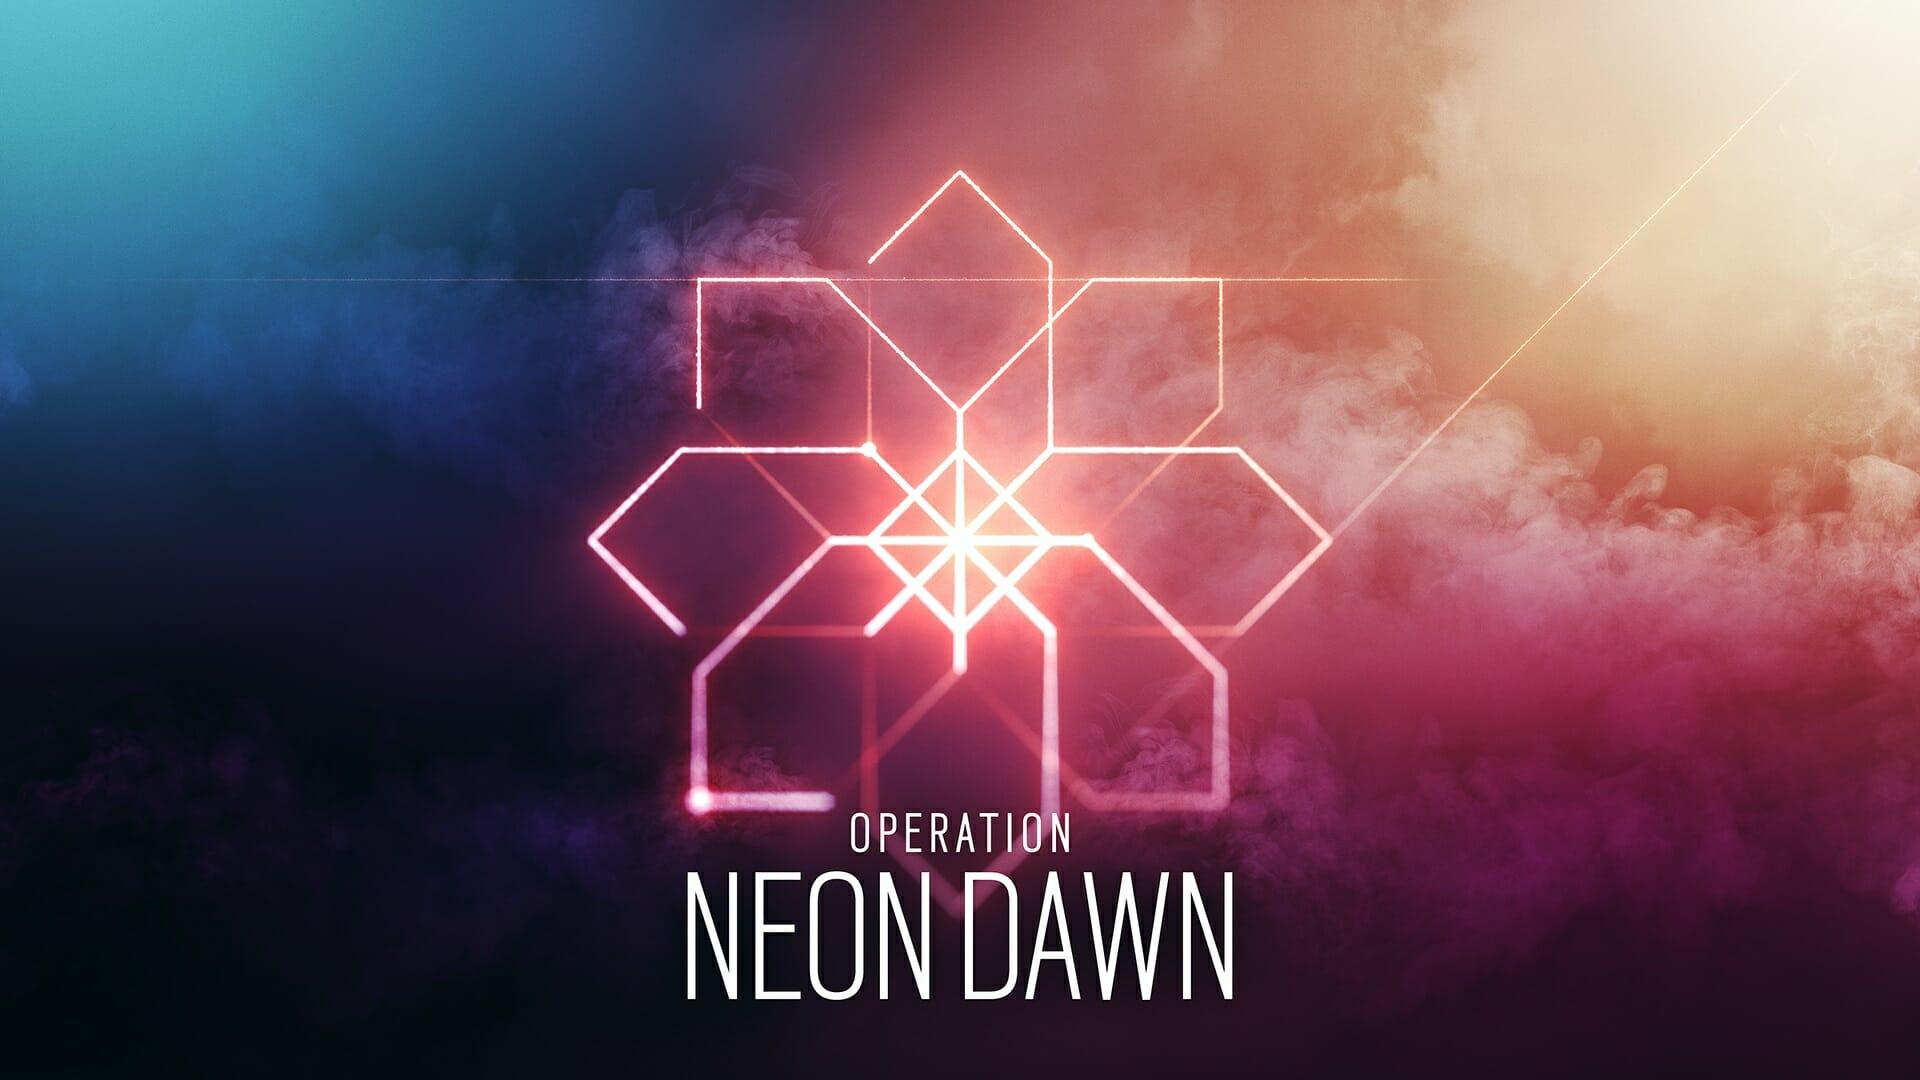 Operation Neon Dawn